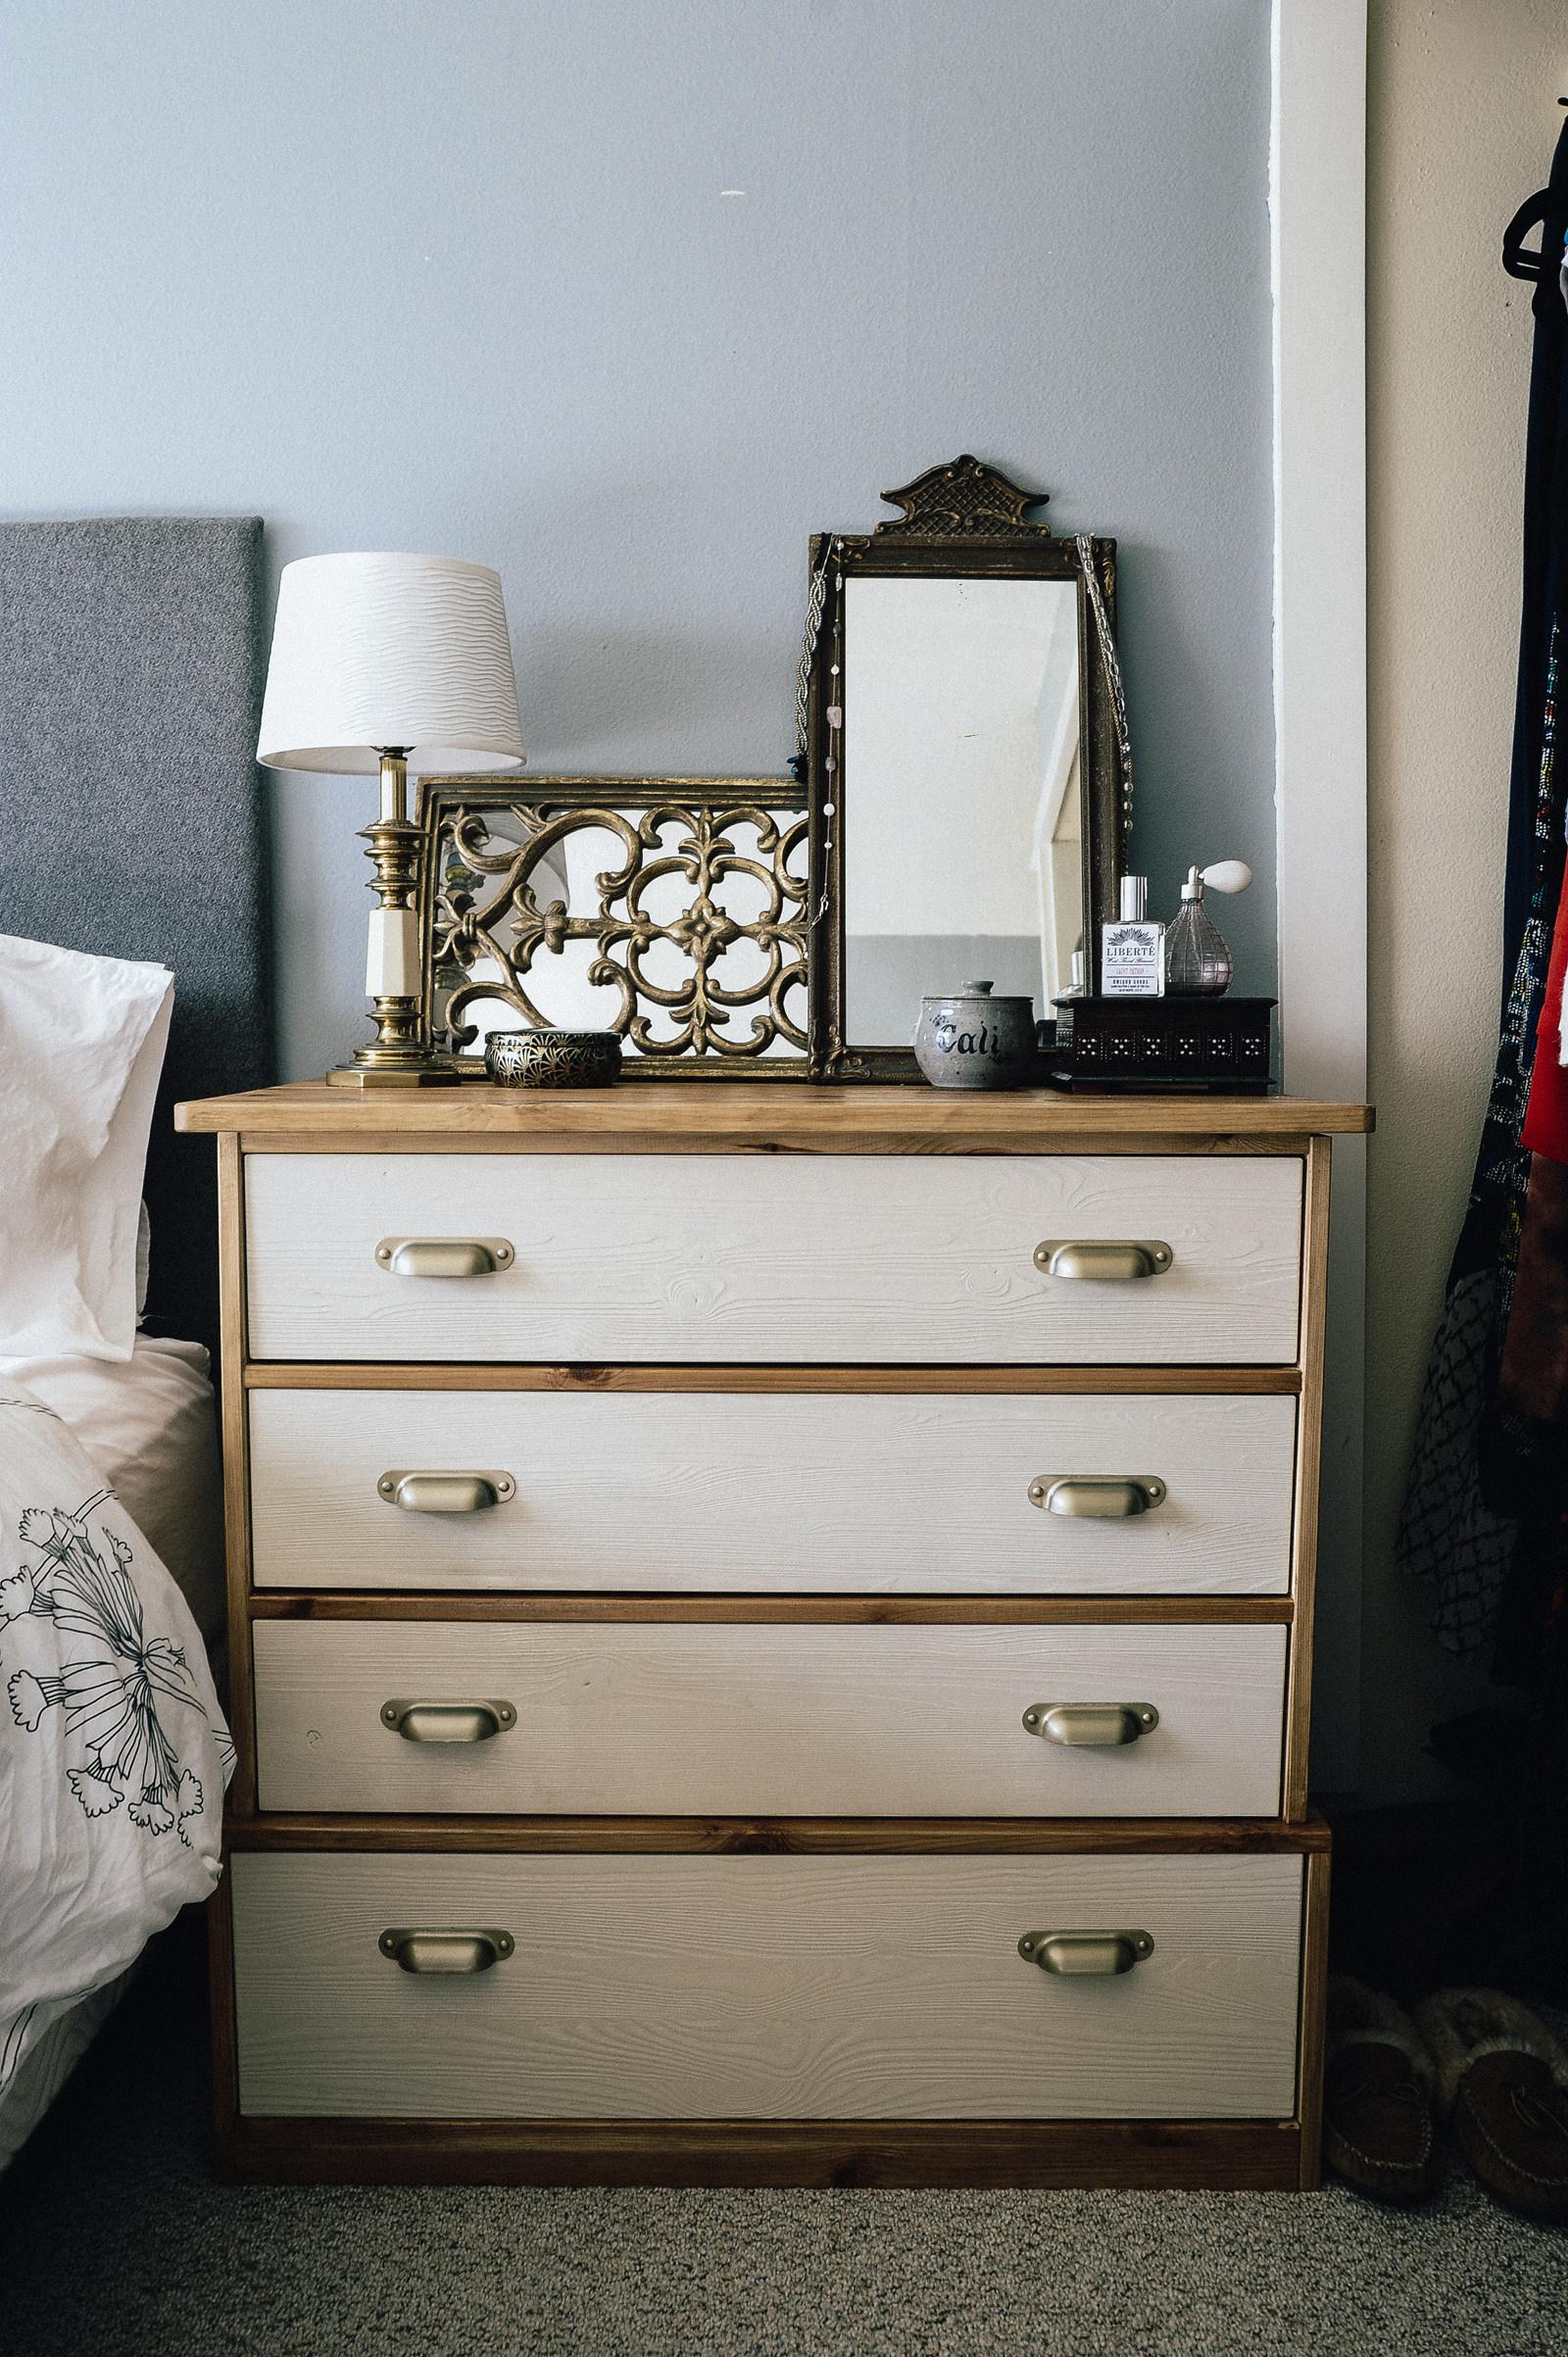 ikea chambre fjell. Black Bedroom Furniture Sets. Home Design Ideas